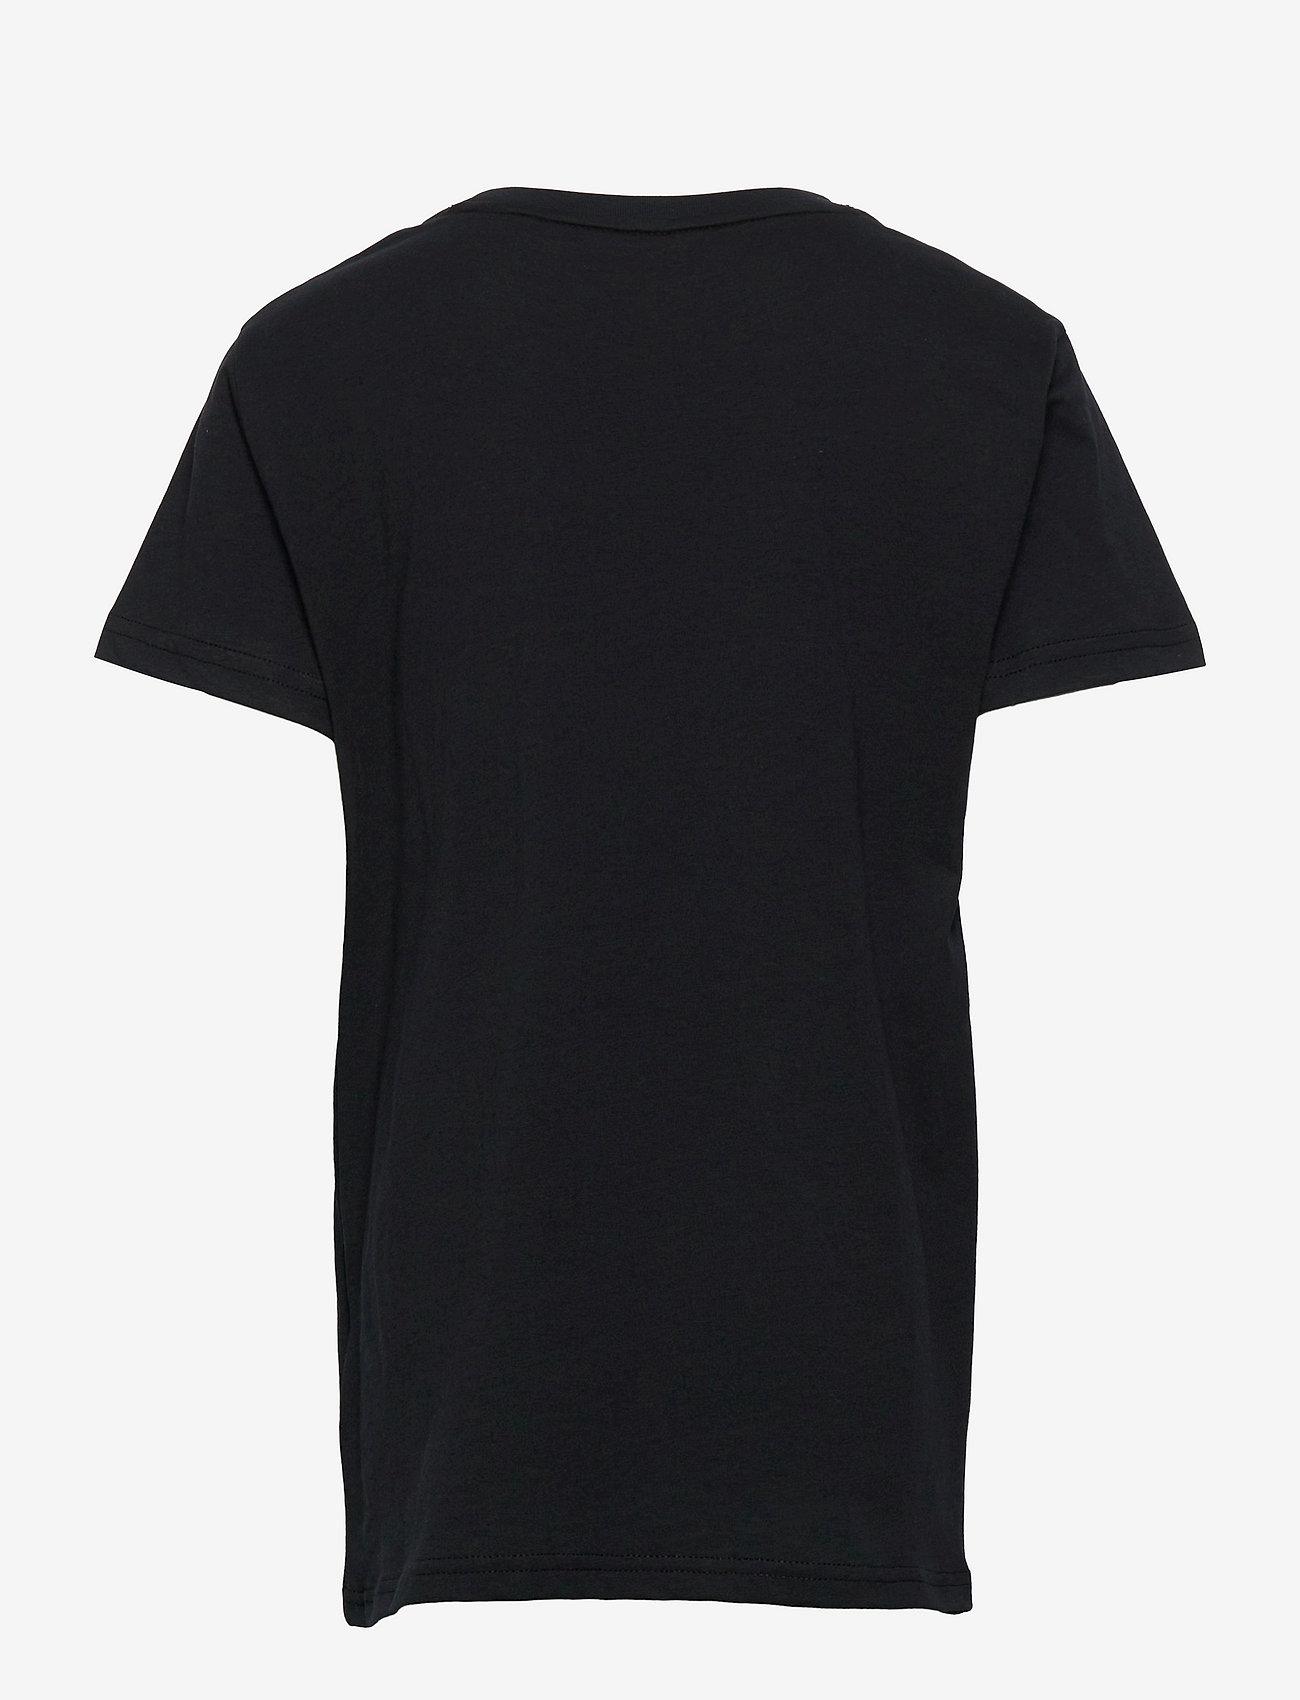 GANT - D2. SPORTY SHIELD SS T-SHIRT - short-sleeved - black - 1